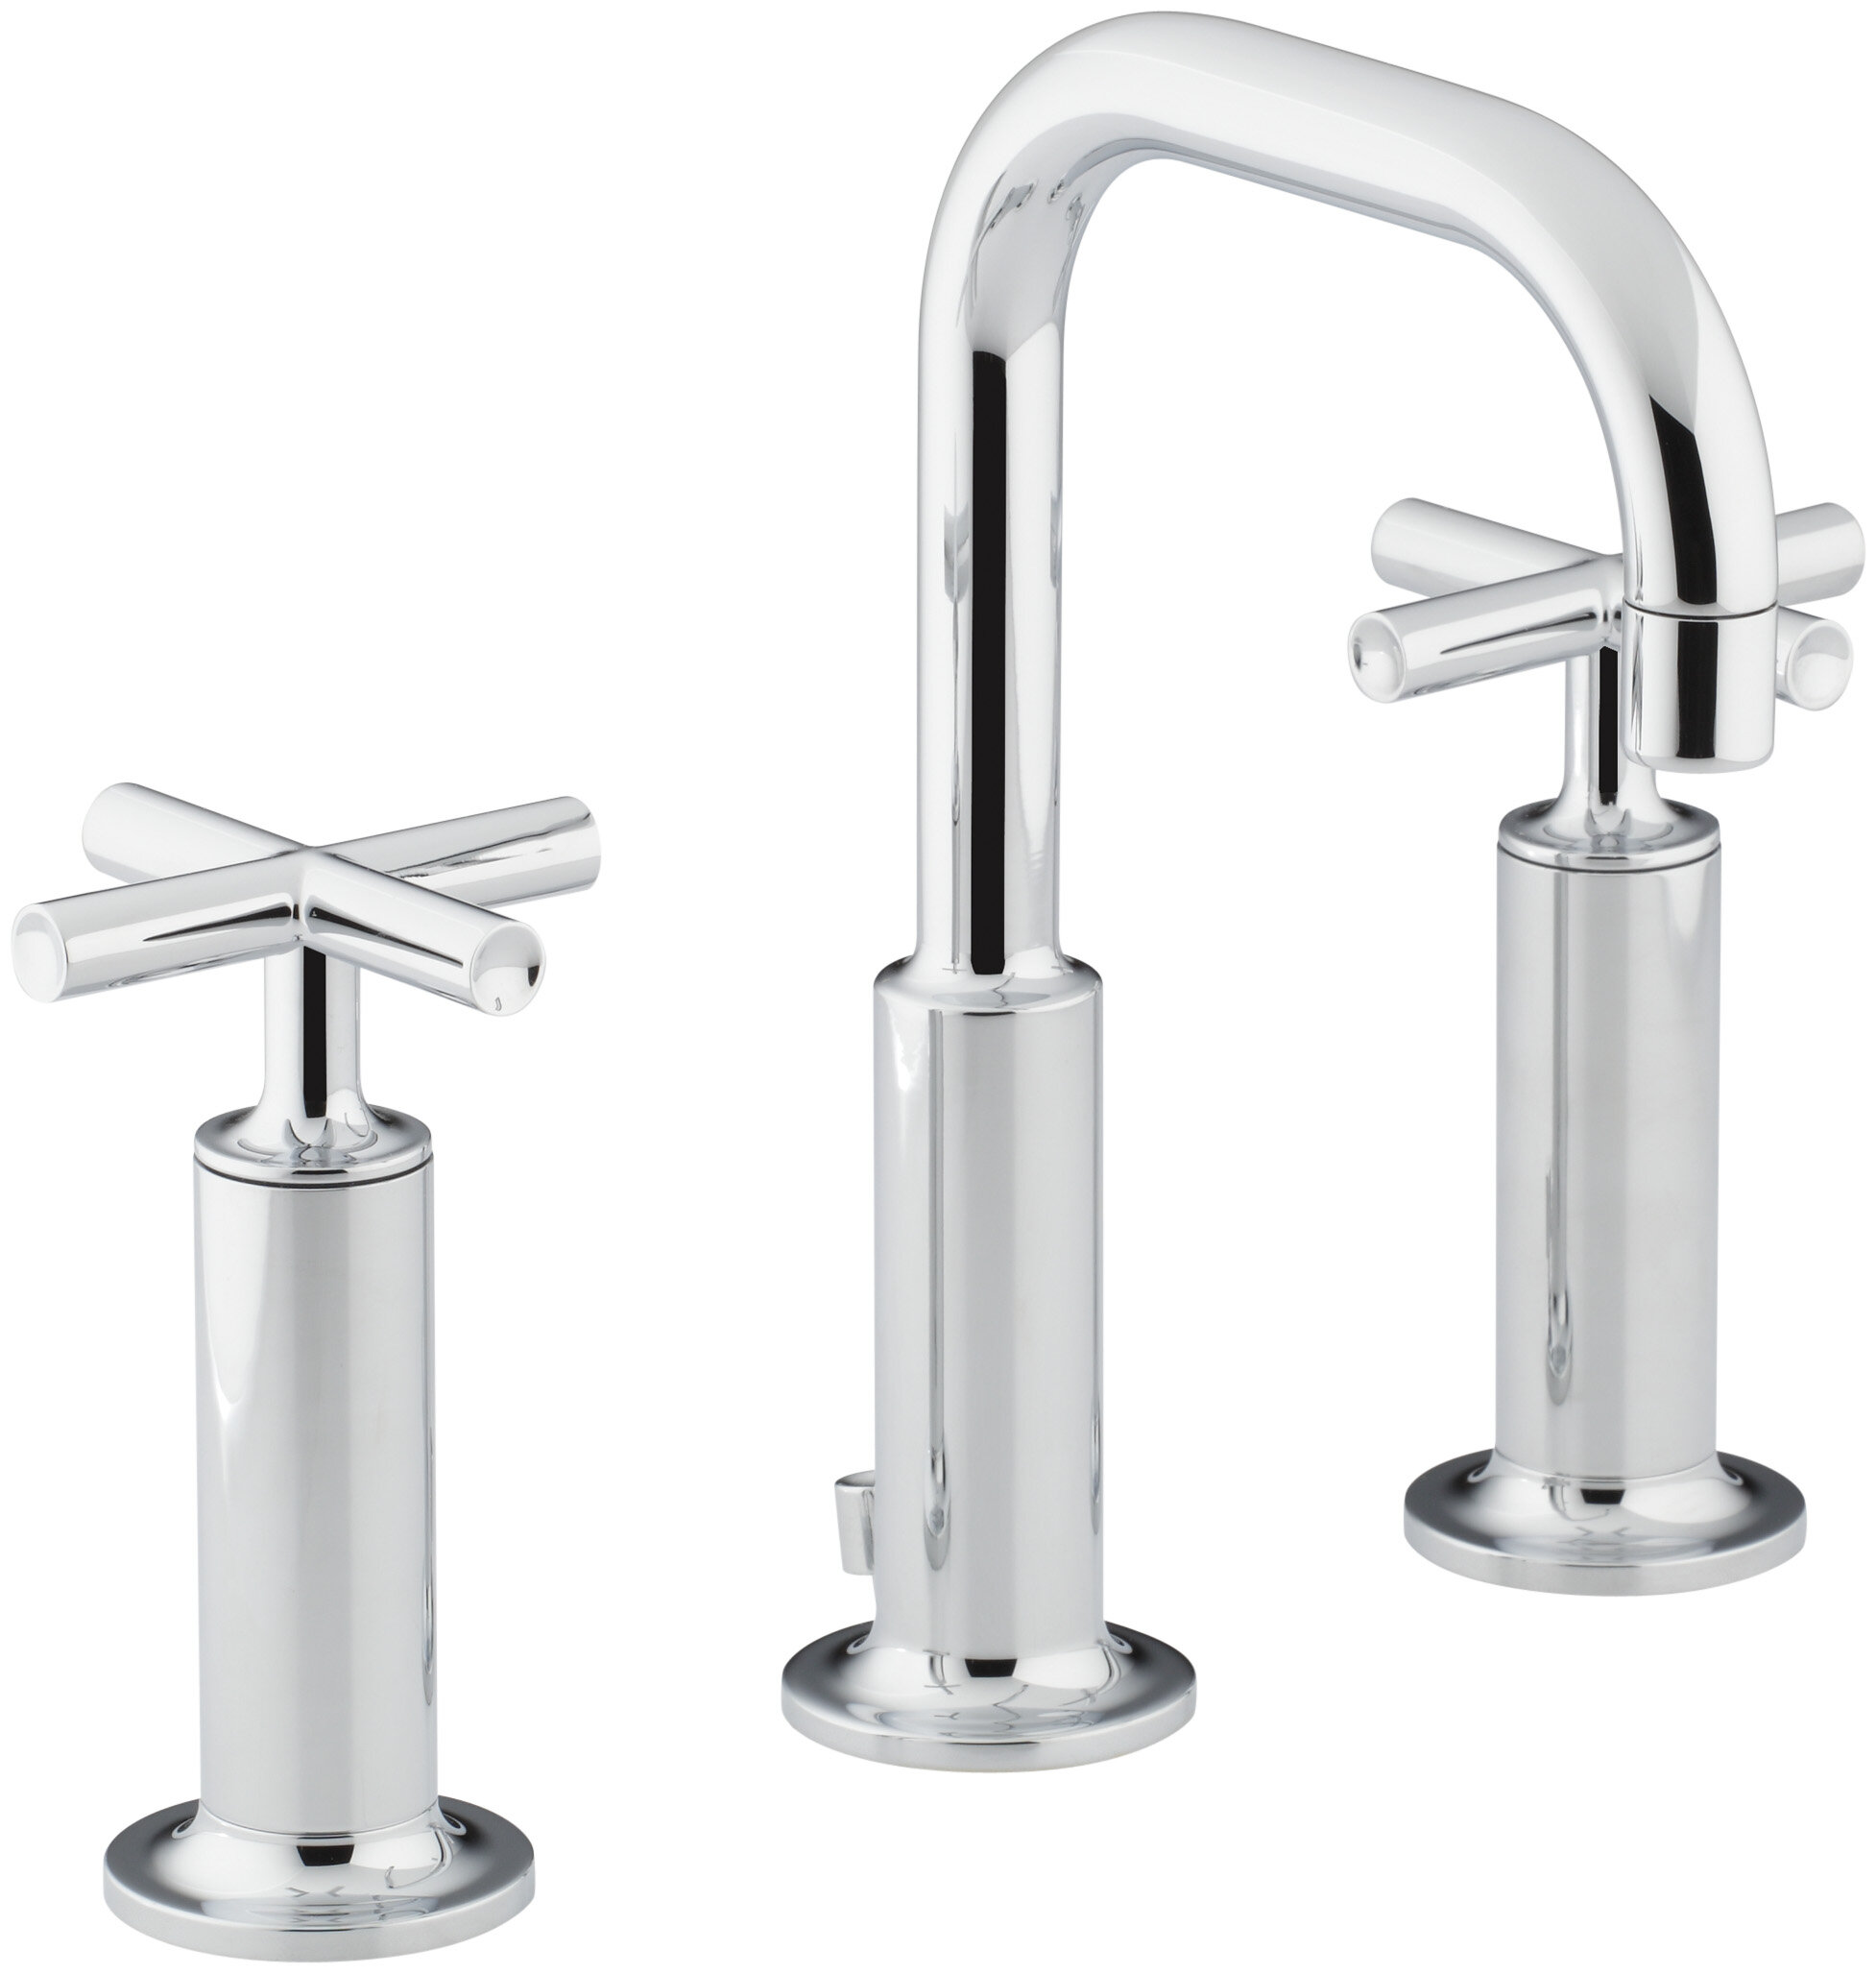 K-14407-3-BN,BV,CP Kohler Purist Widespread Bathroom Sink Faucet ...